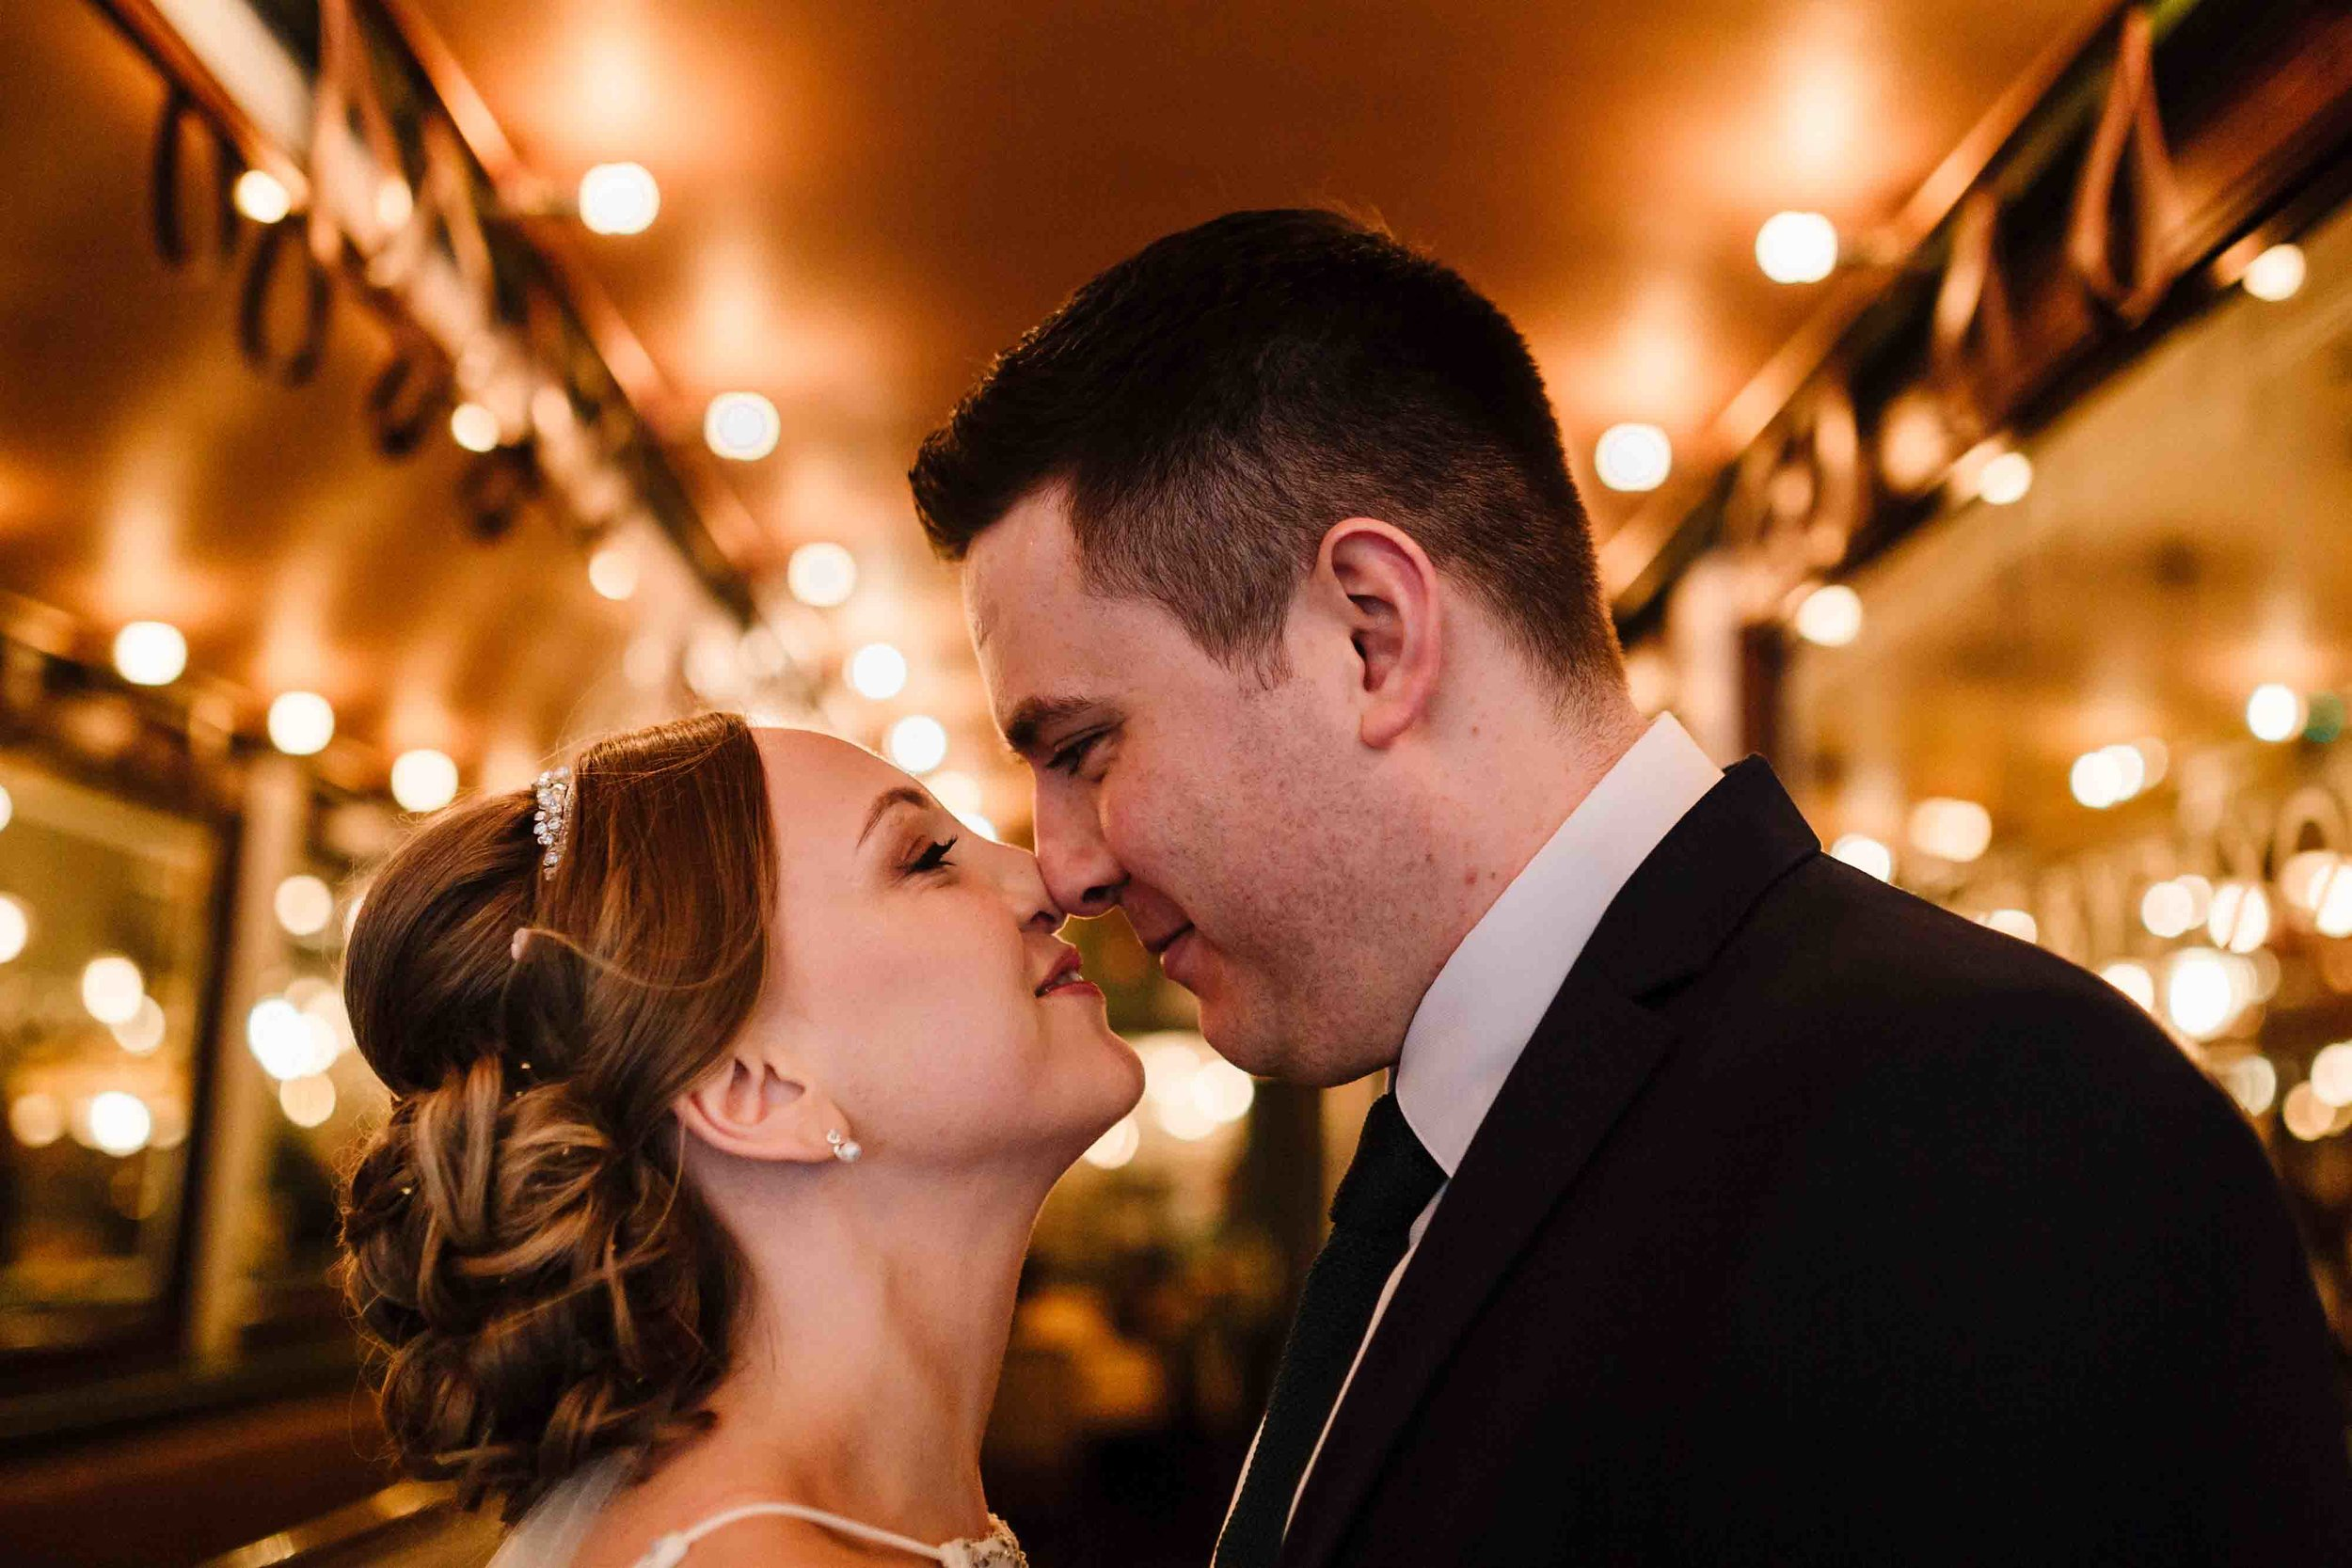 A bride and groom eskimo kissing